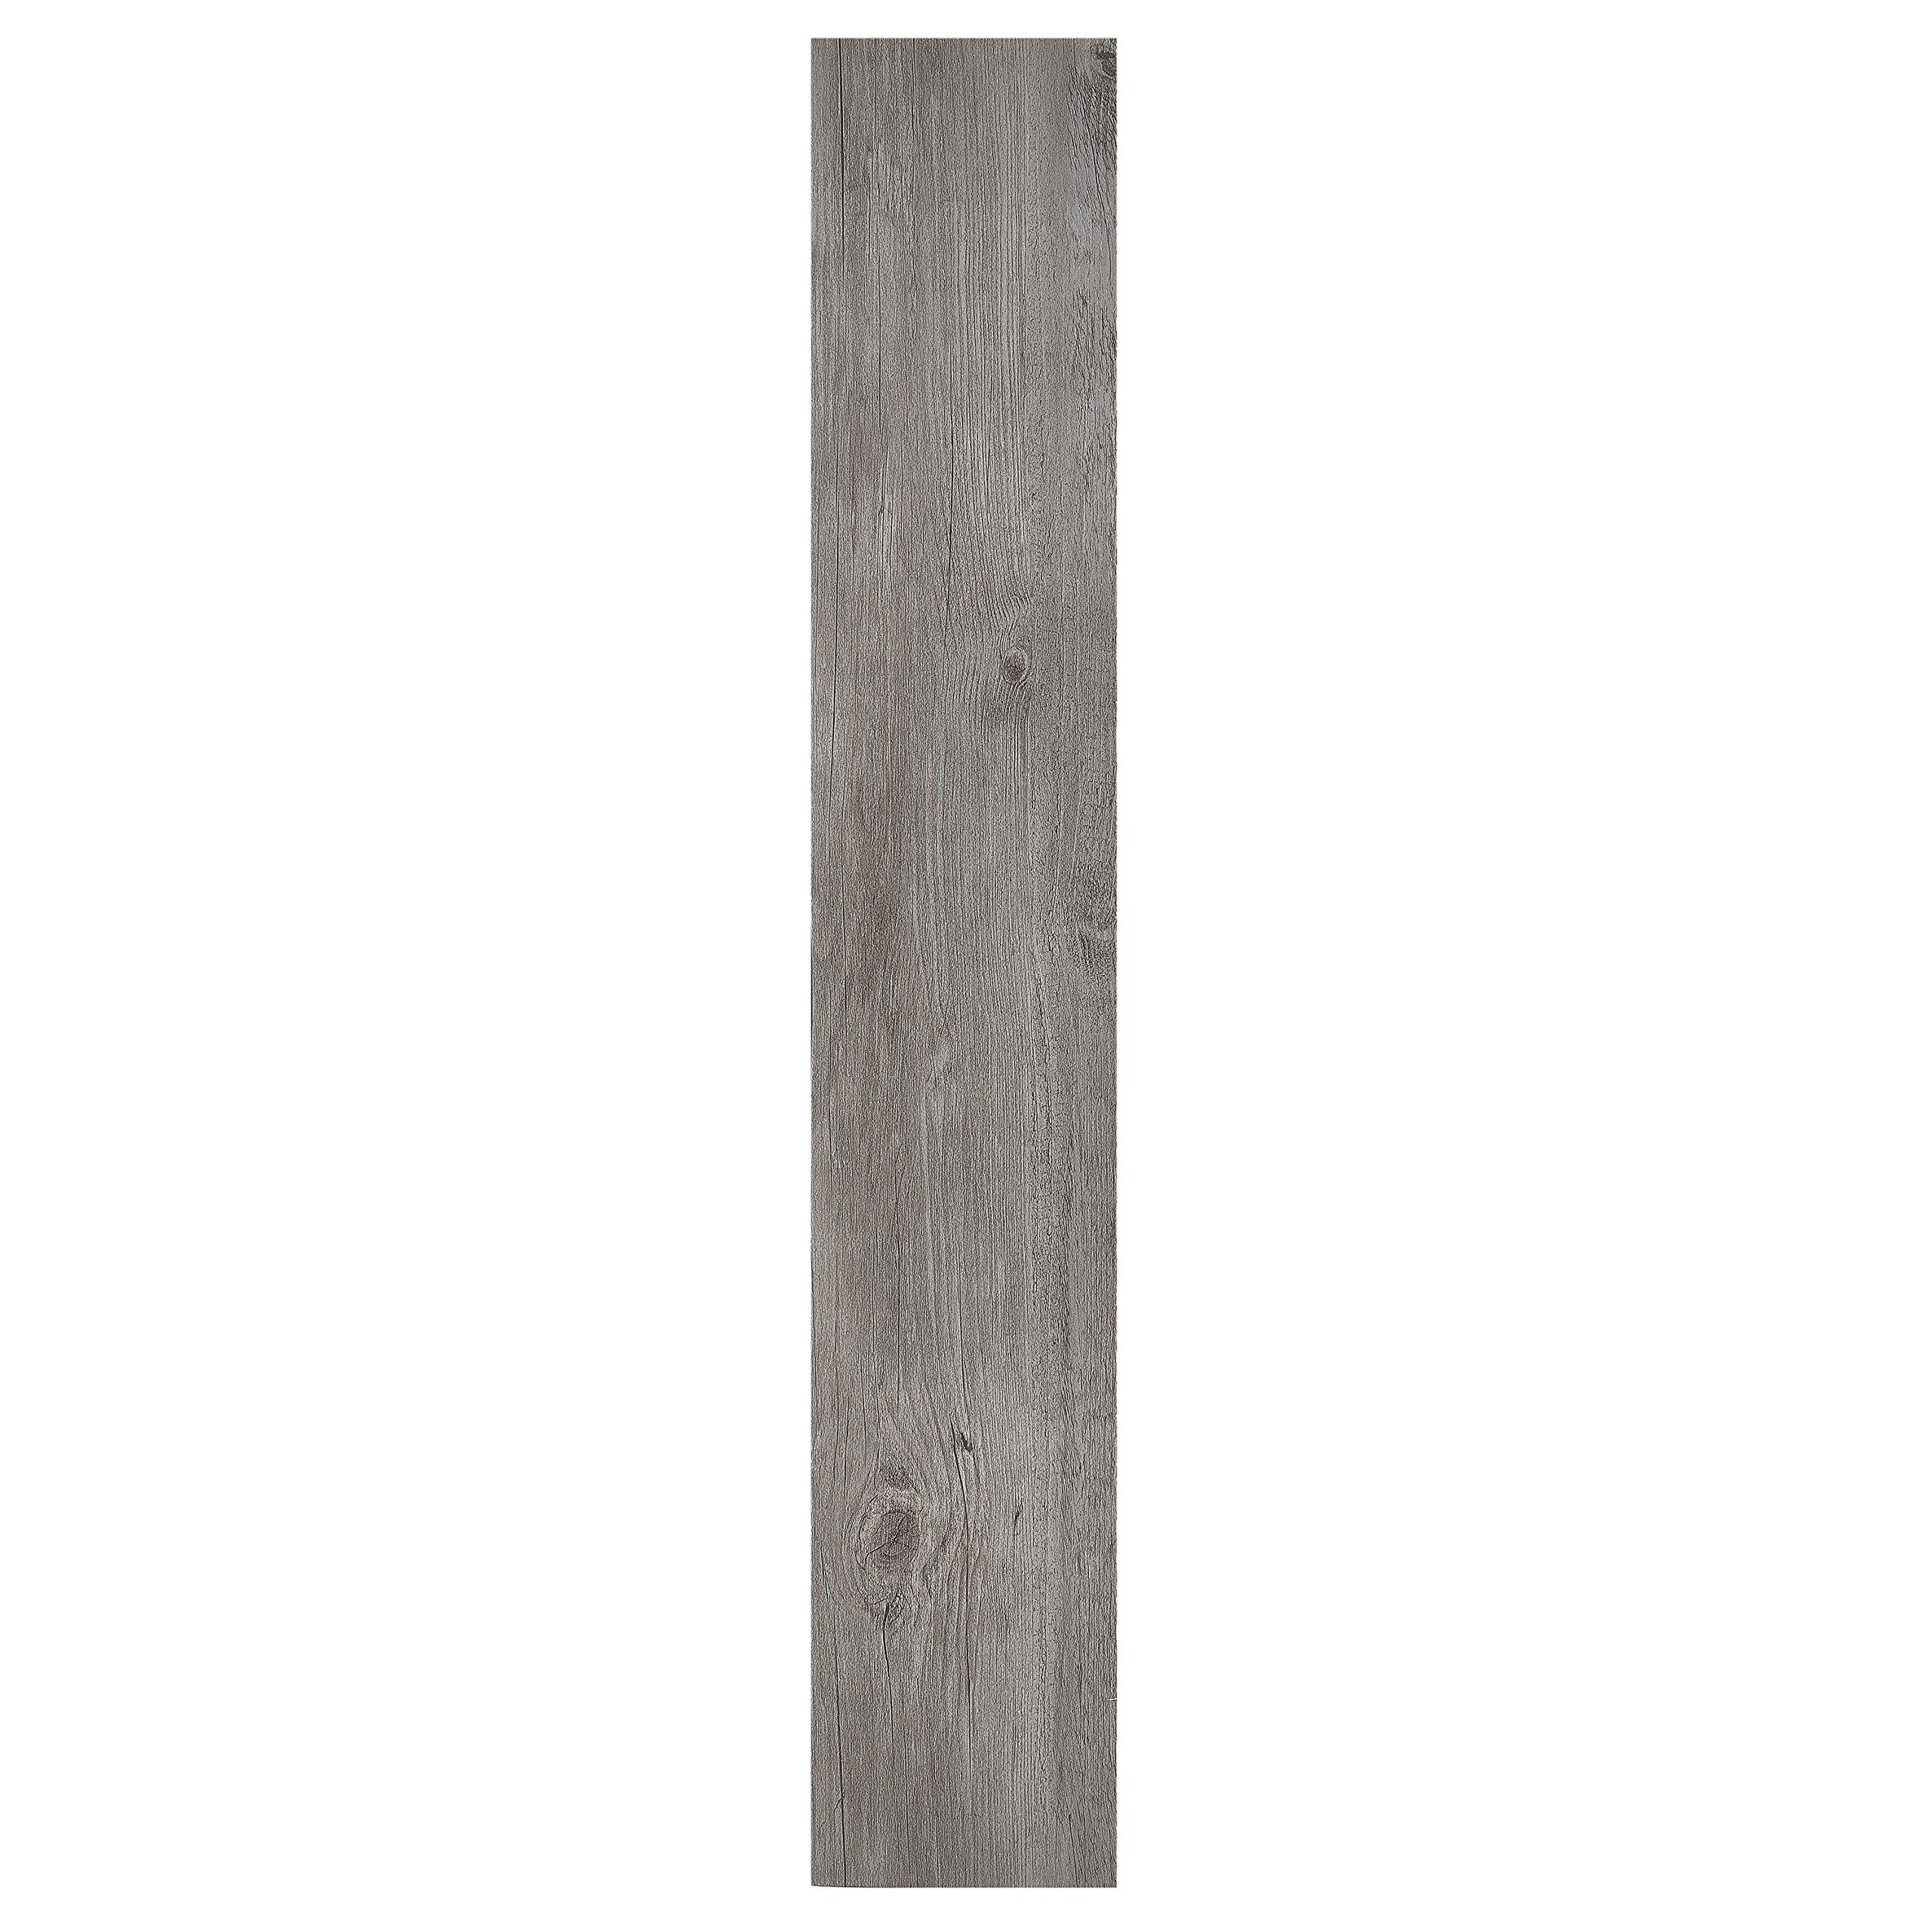 Achig #Achim Home Furnishings VFP1.2GO10 Achim Home Furnishings Nexus 1.2Mm Vinyl Floor Planks, 6 Inches x 36 Inches, Light Grey Oak,